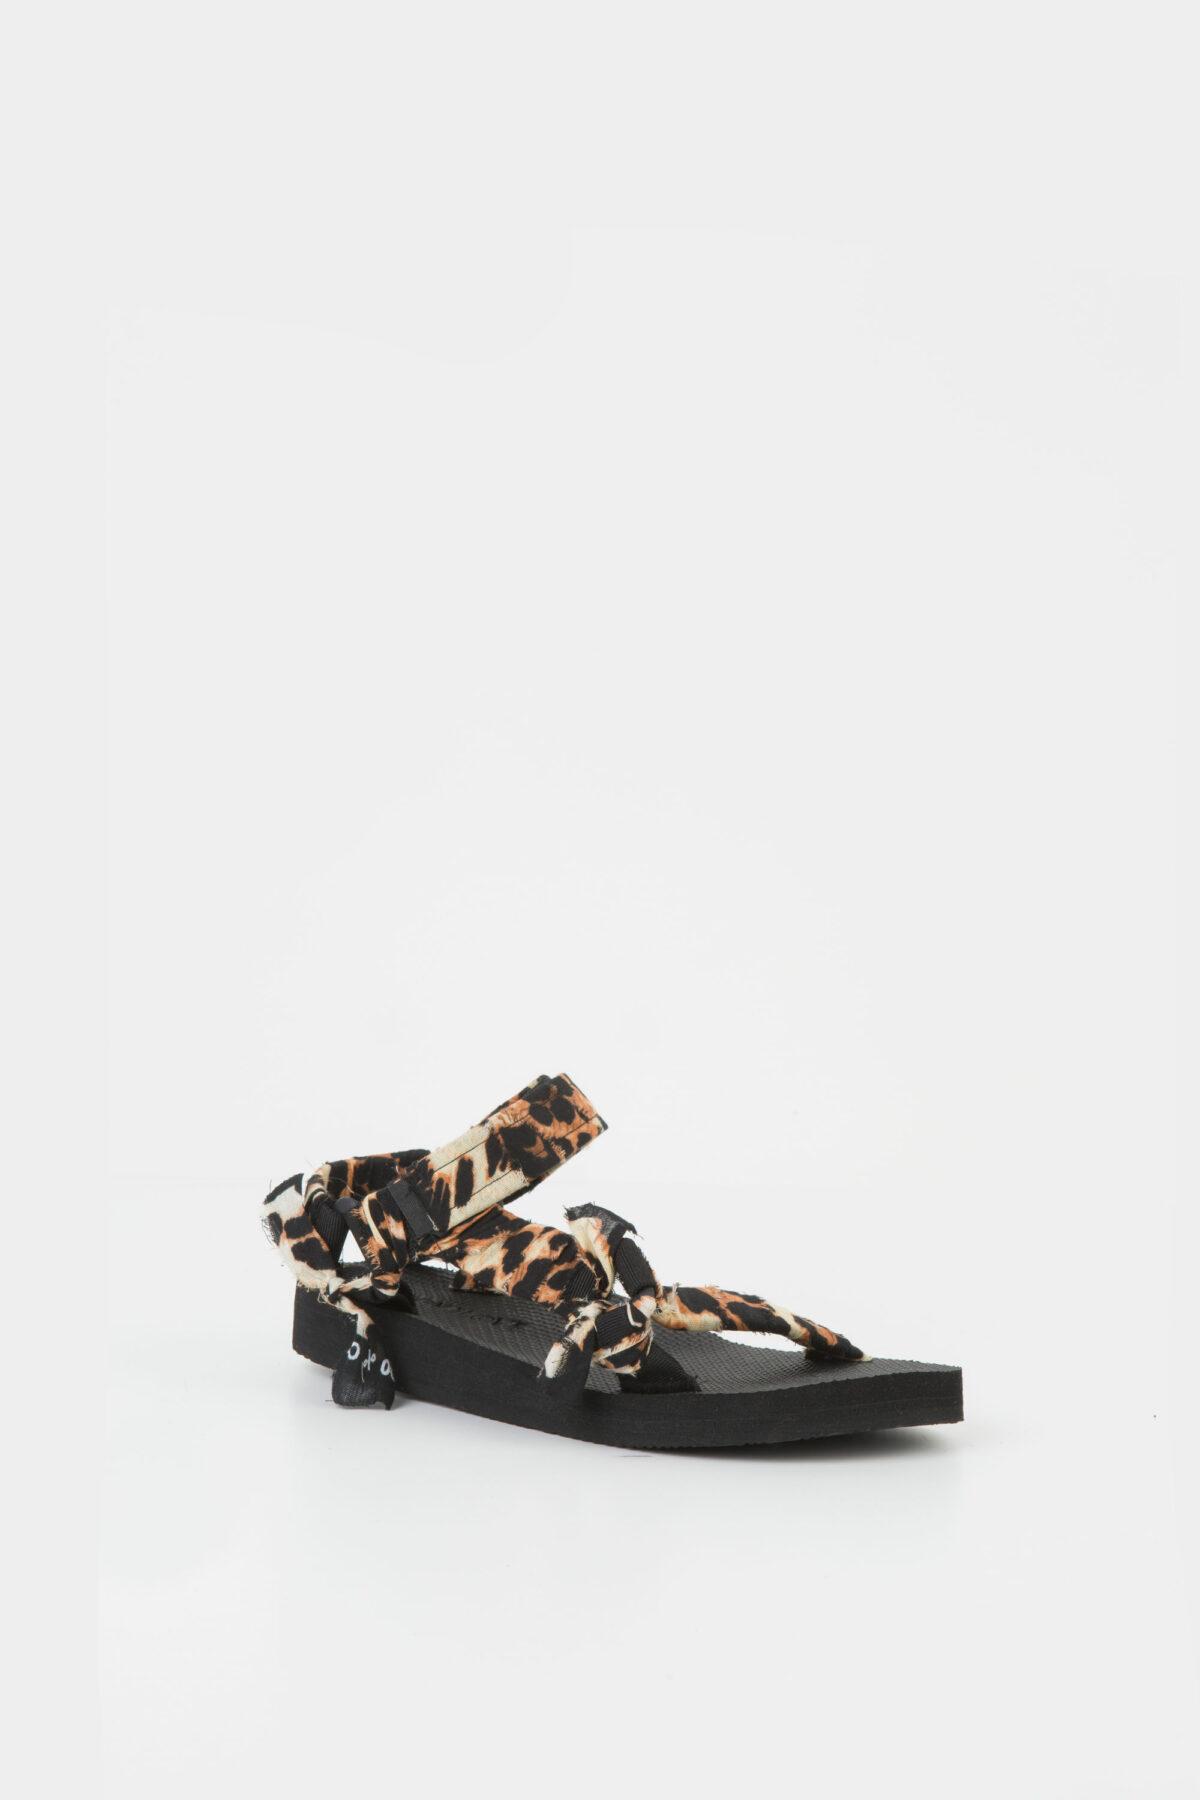 trekky-leopard-bandana-arizona-love-foam-sandal-matchboxathens